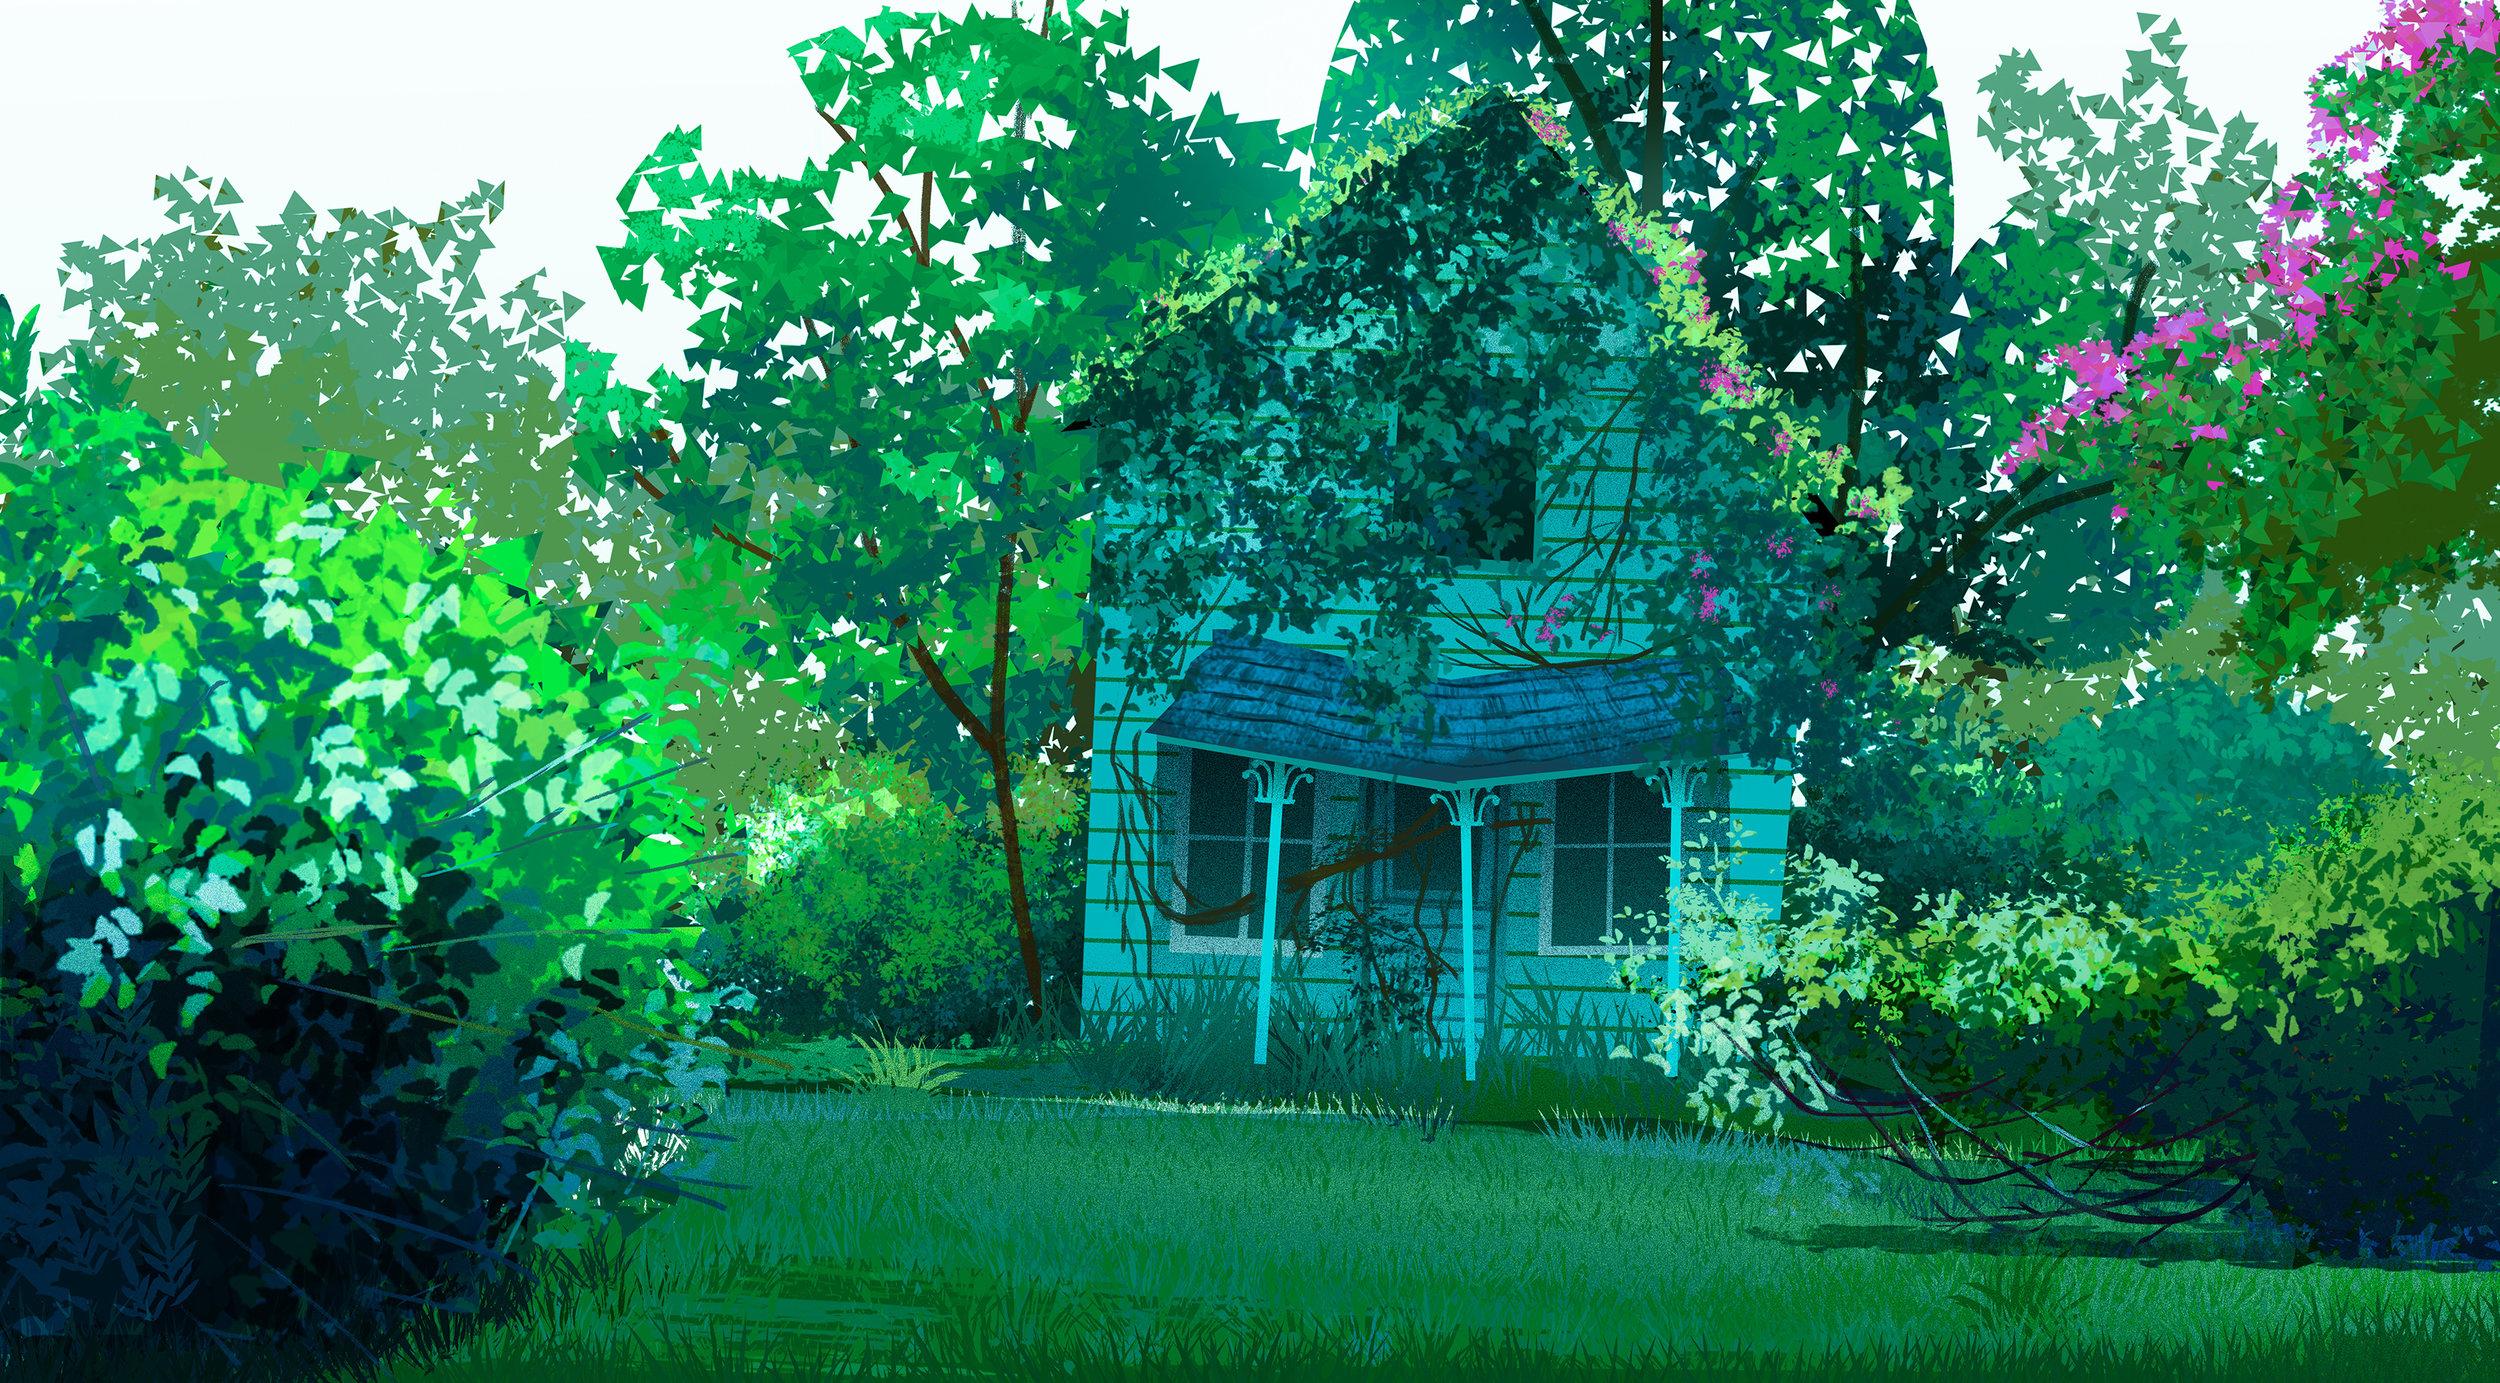 abandonedhouse1_4_small.jpg